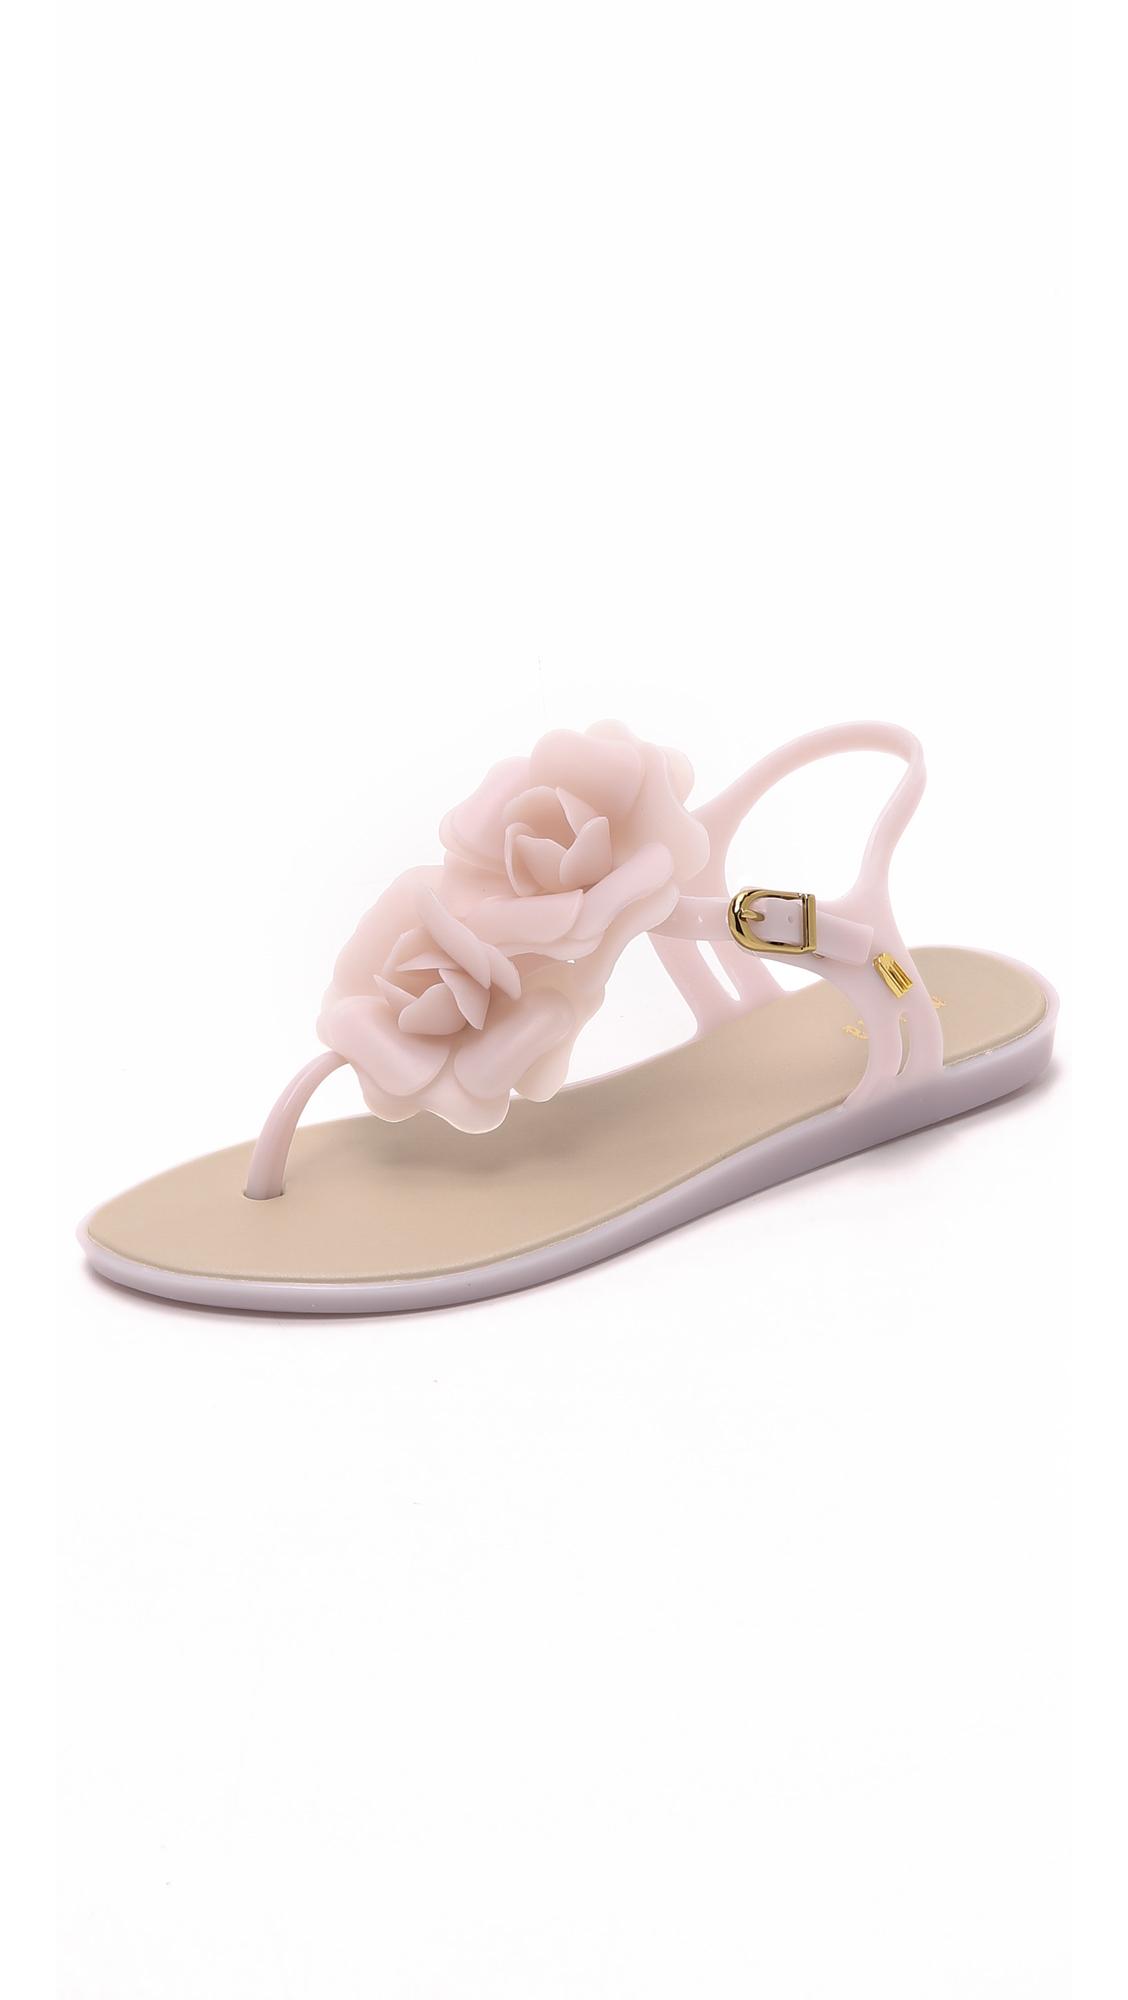 14deadb17083e2 Melissa Solar Garden Sandals in Natural - Lyst